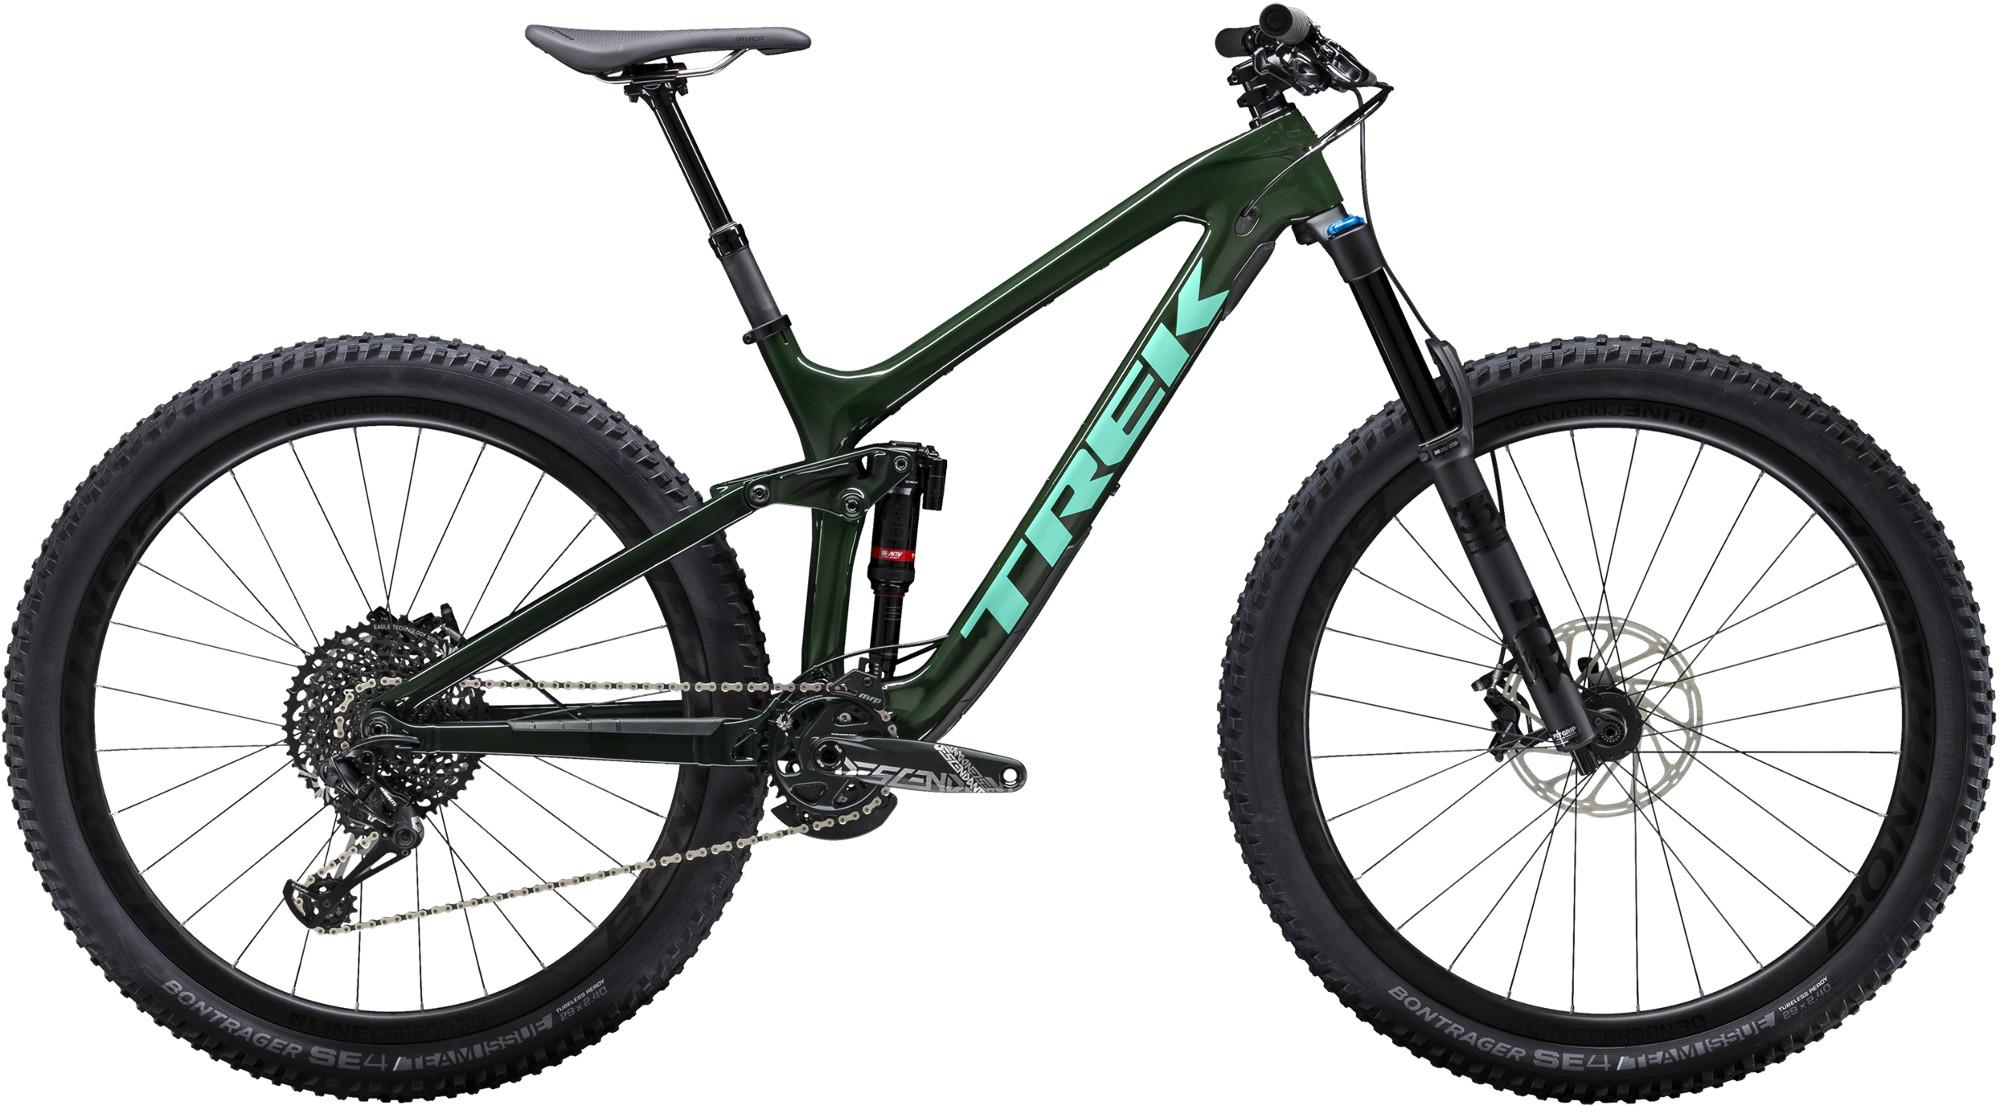 Trek Slash 9.8 29er Mountain Bike 2019 British Racing Green